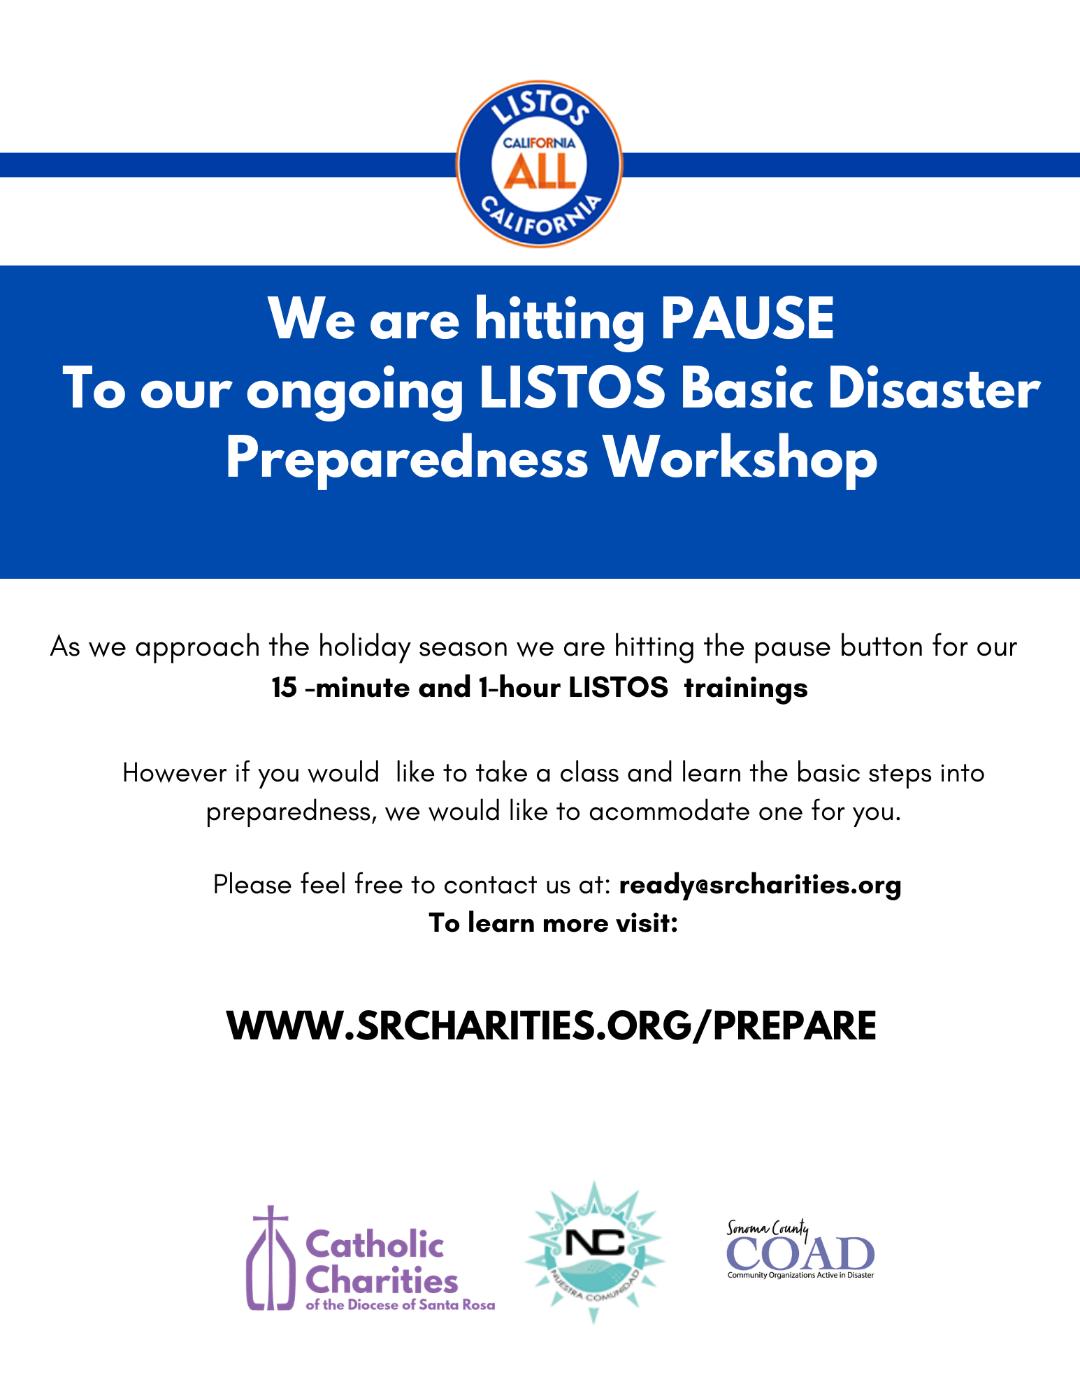 A LISTOS Basic Disaster Preparedness Workshop notice